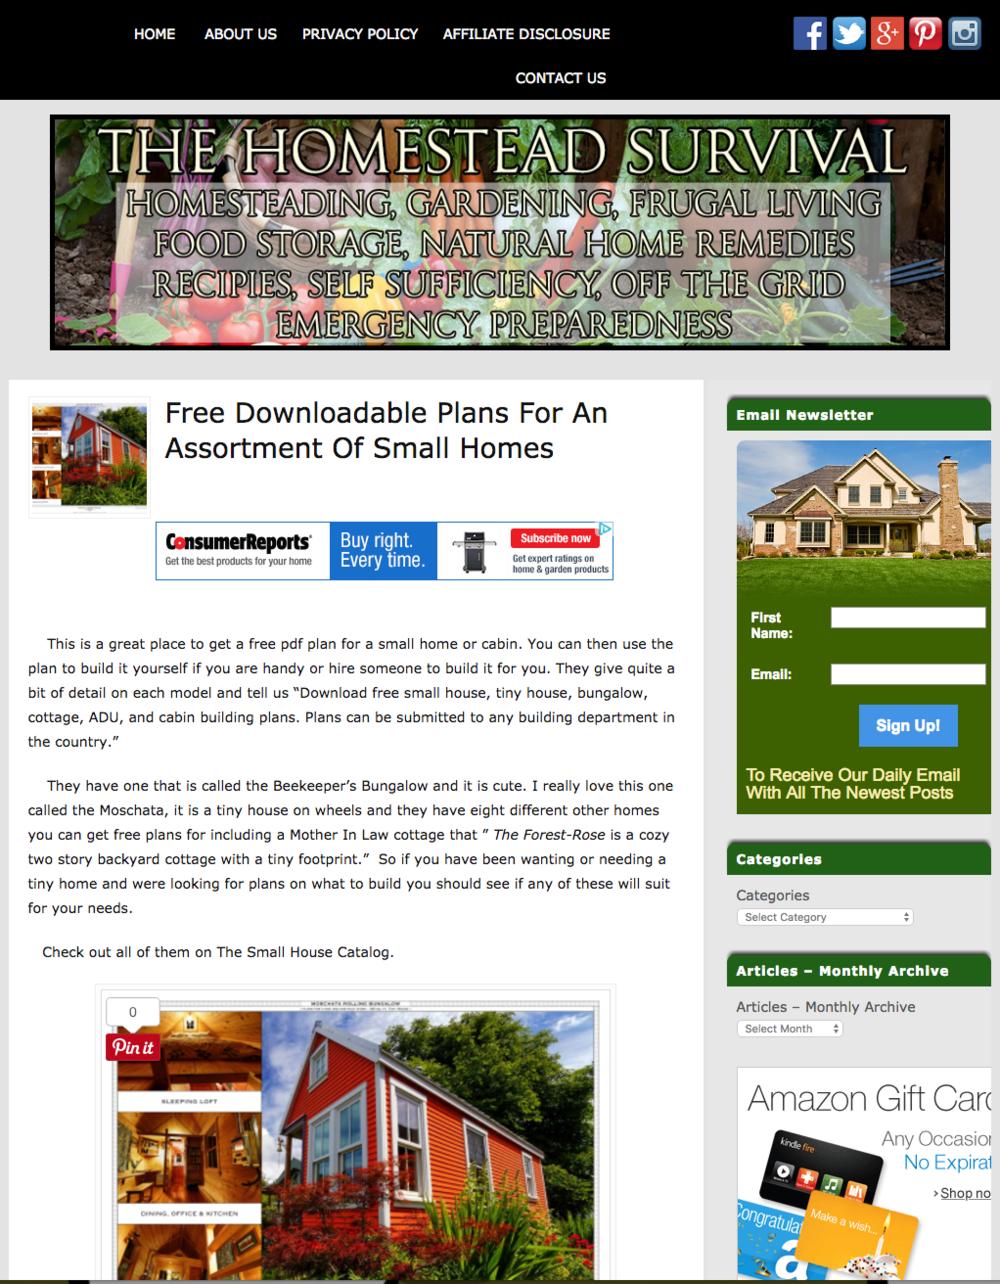 The Homestead Survival Blog